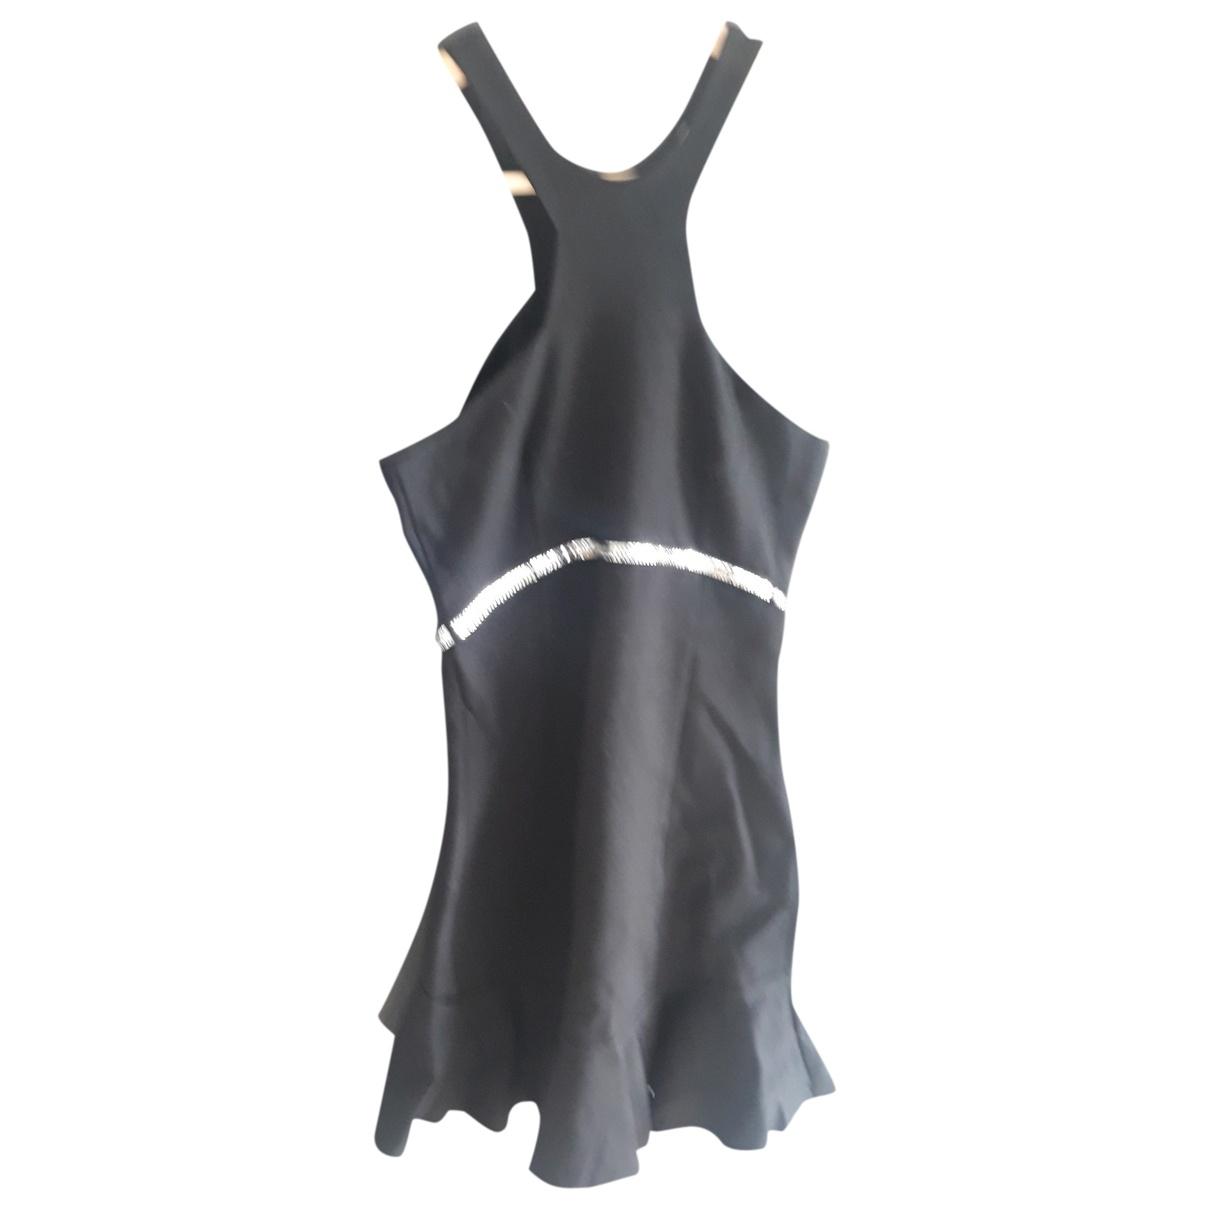 Maje \N Black Cotton - elasthane dress for Women 1 0-5